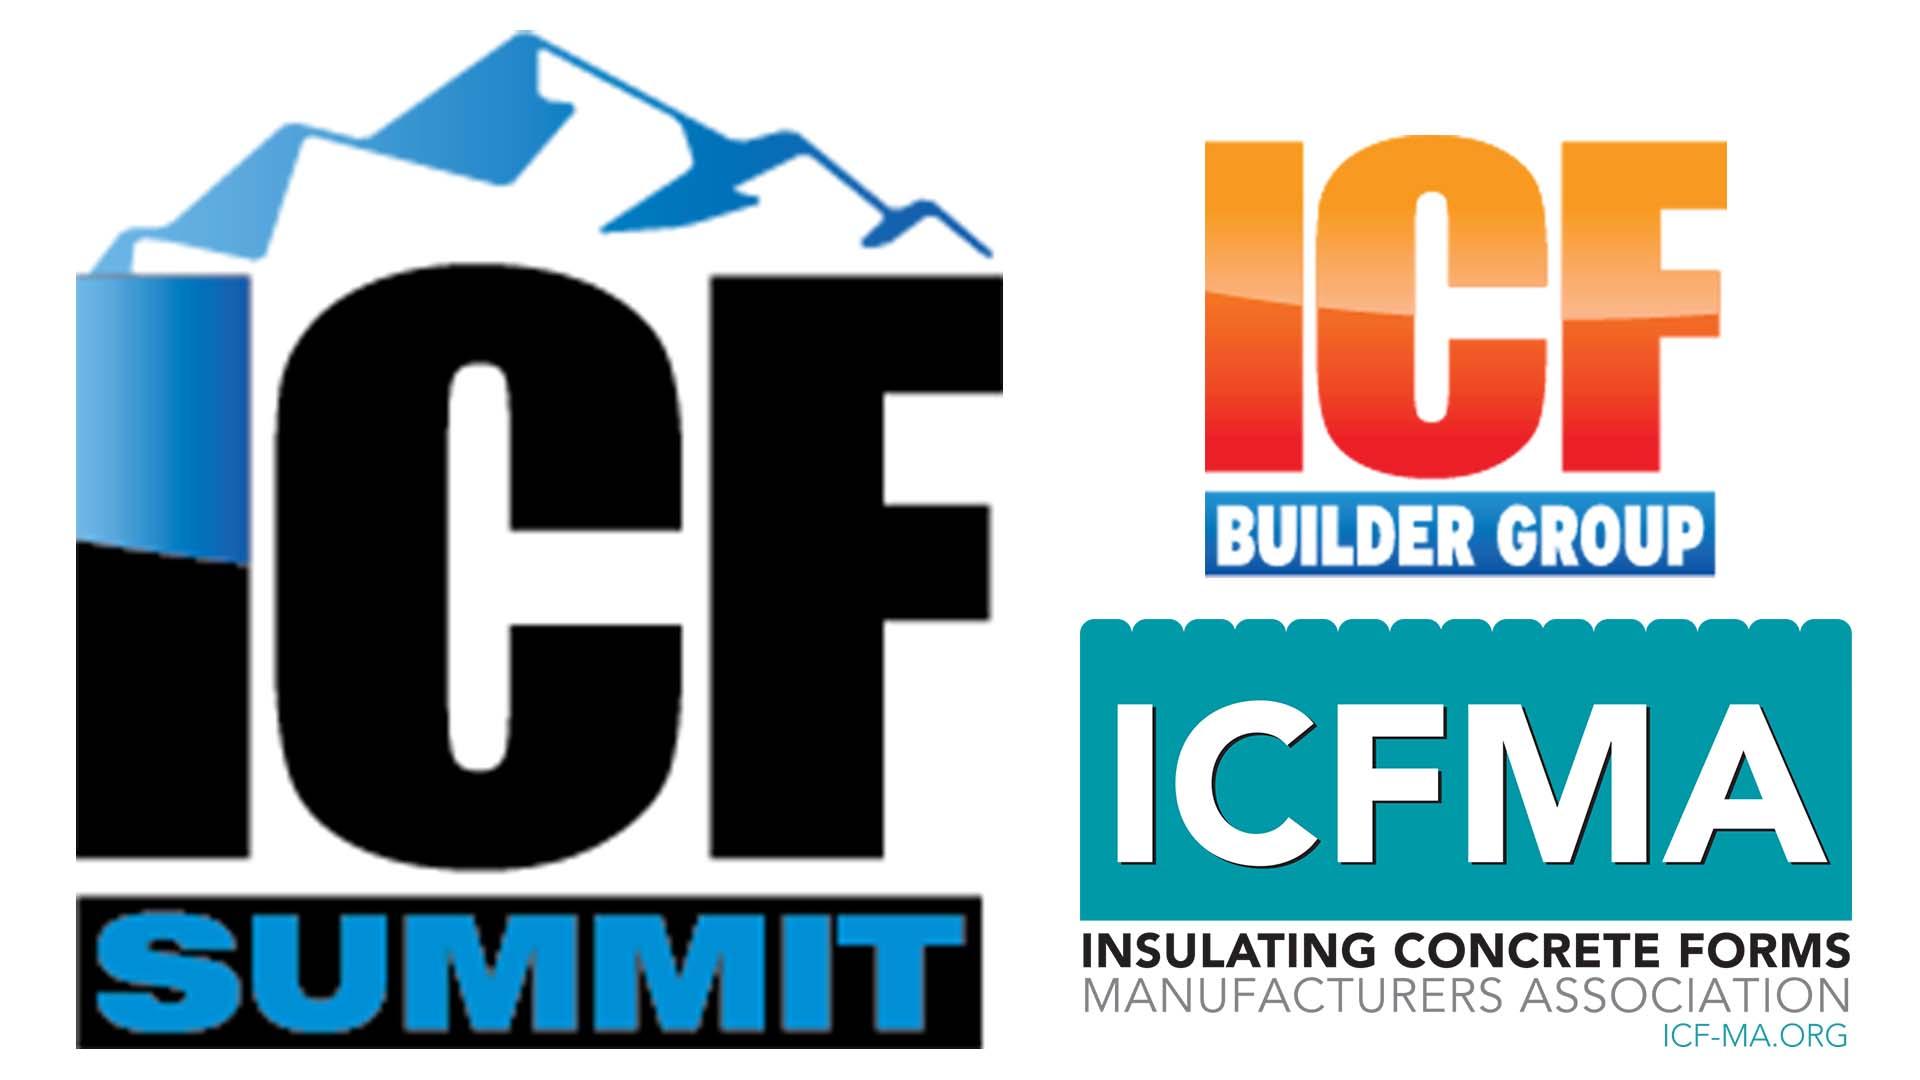 The 2018 ICF Summit